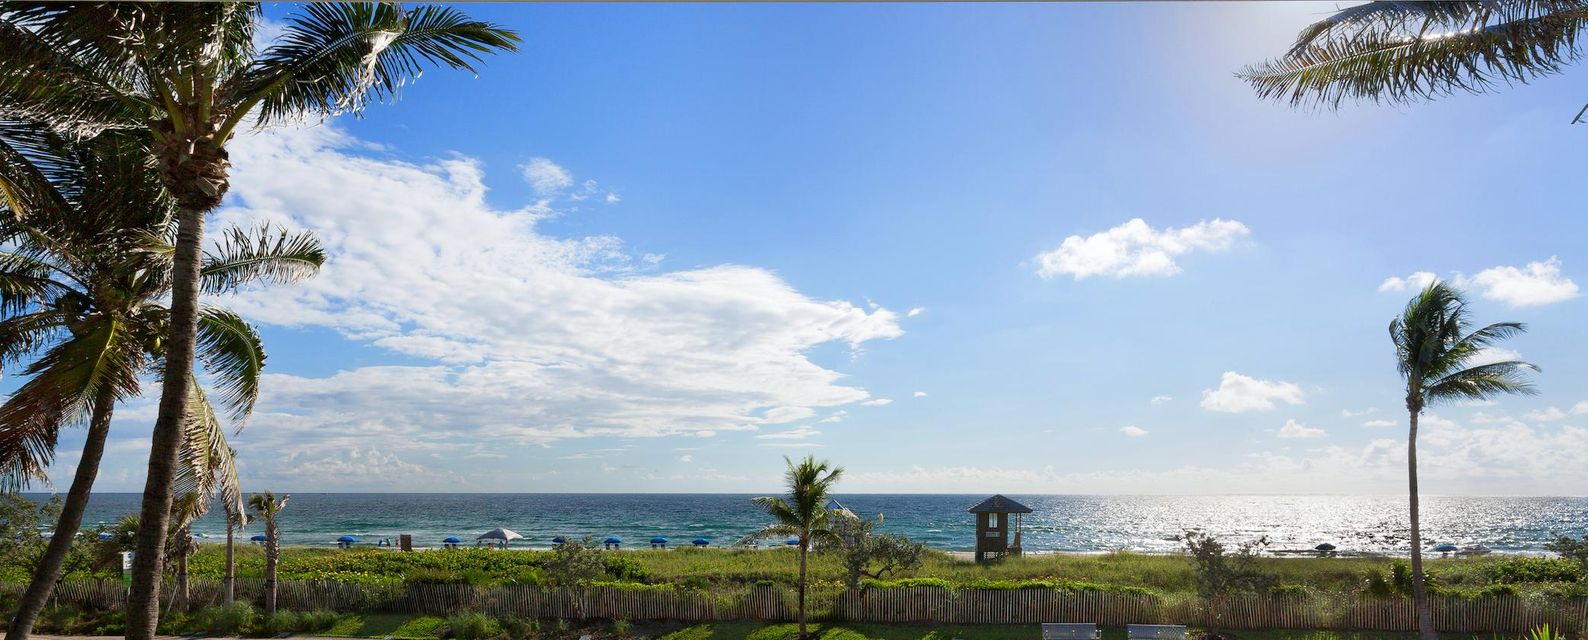 220 South Ocean Boulevard Delray Beach, FL 33483 photo 5